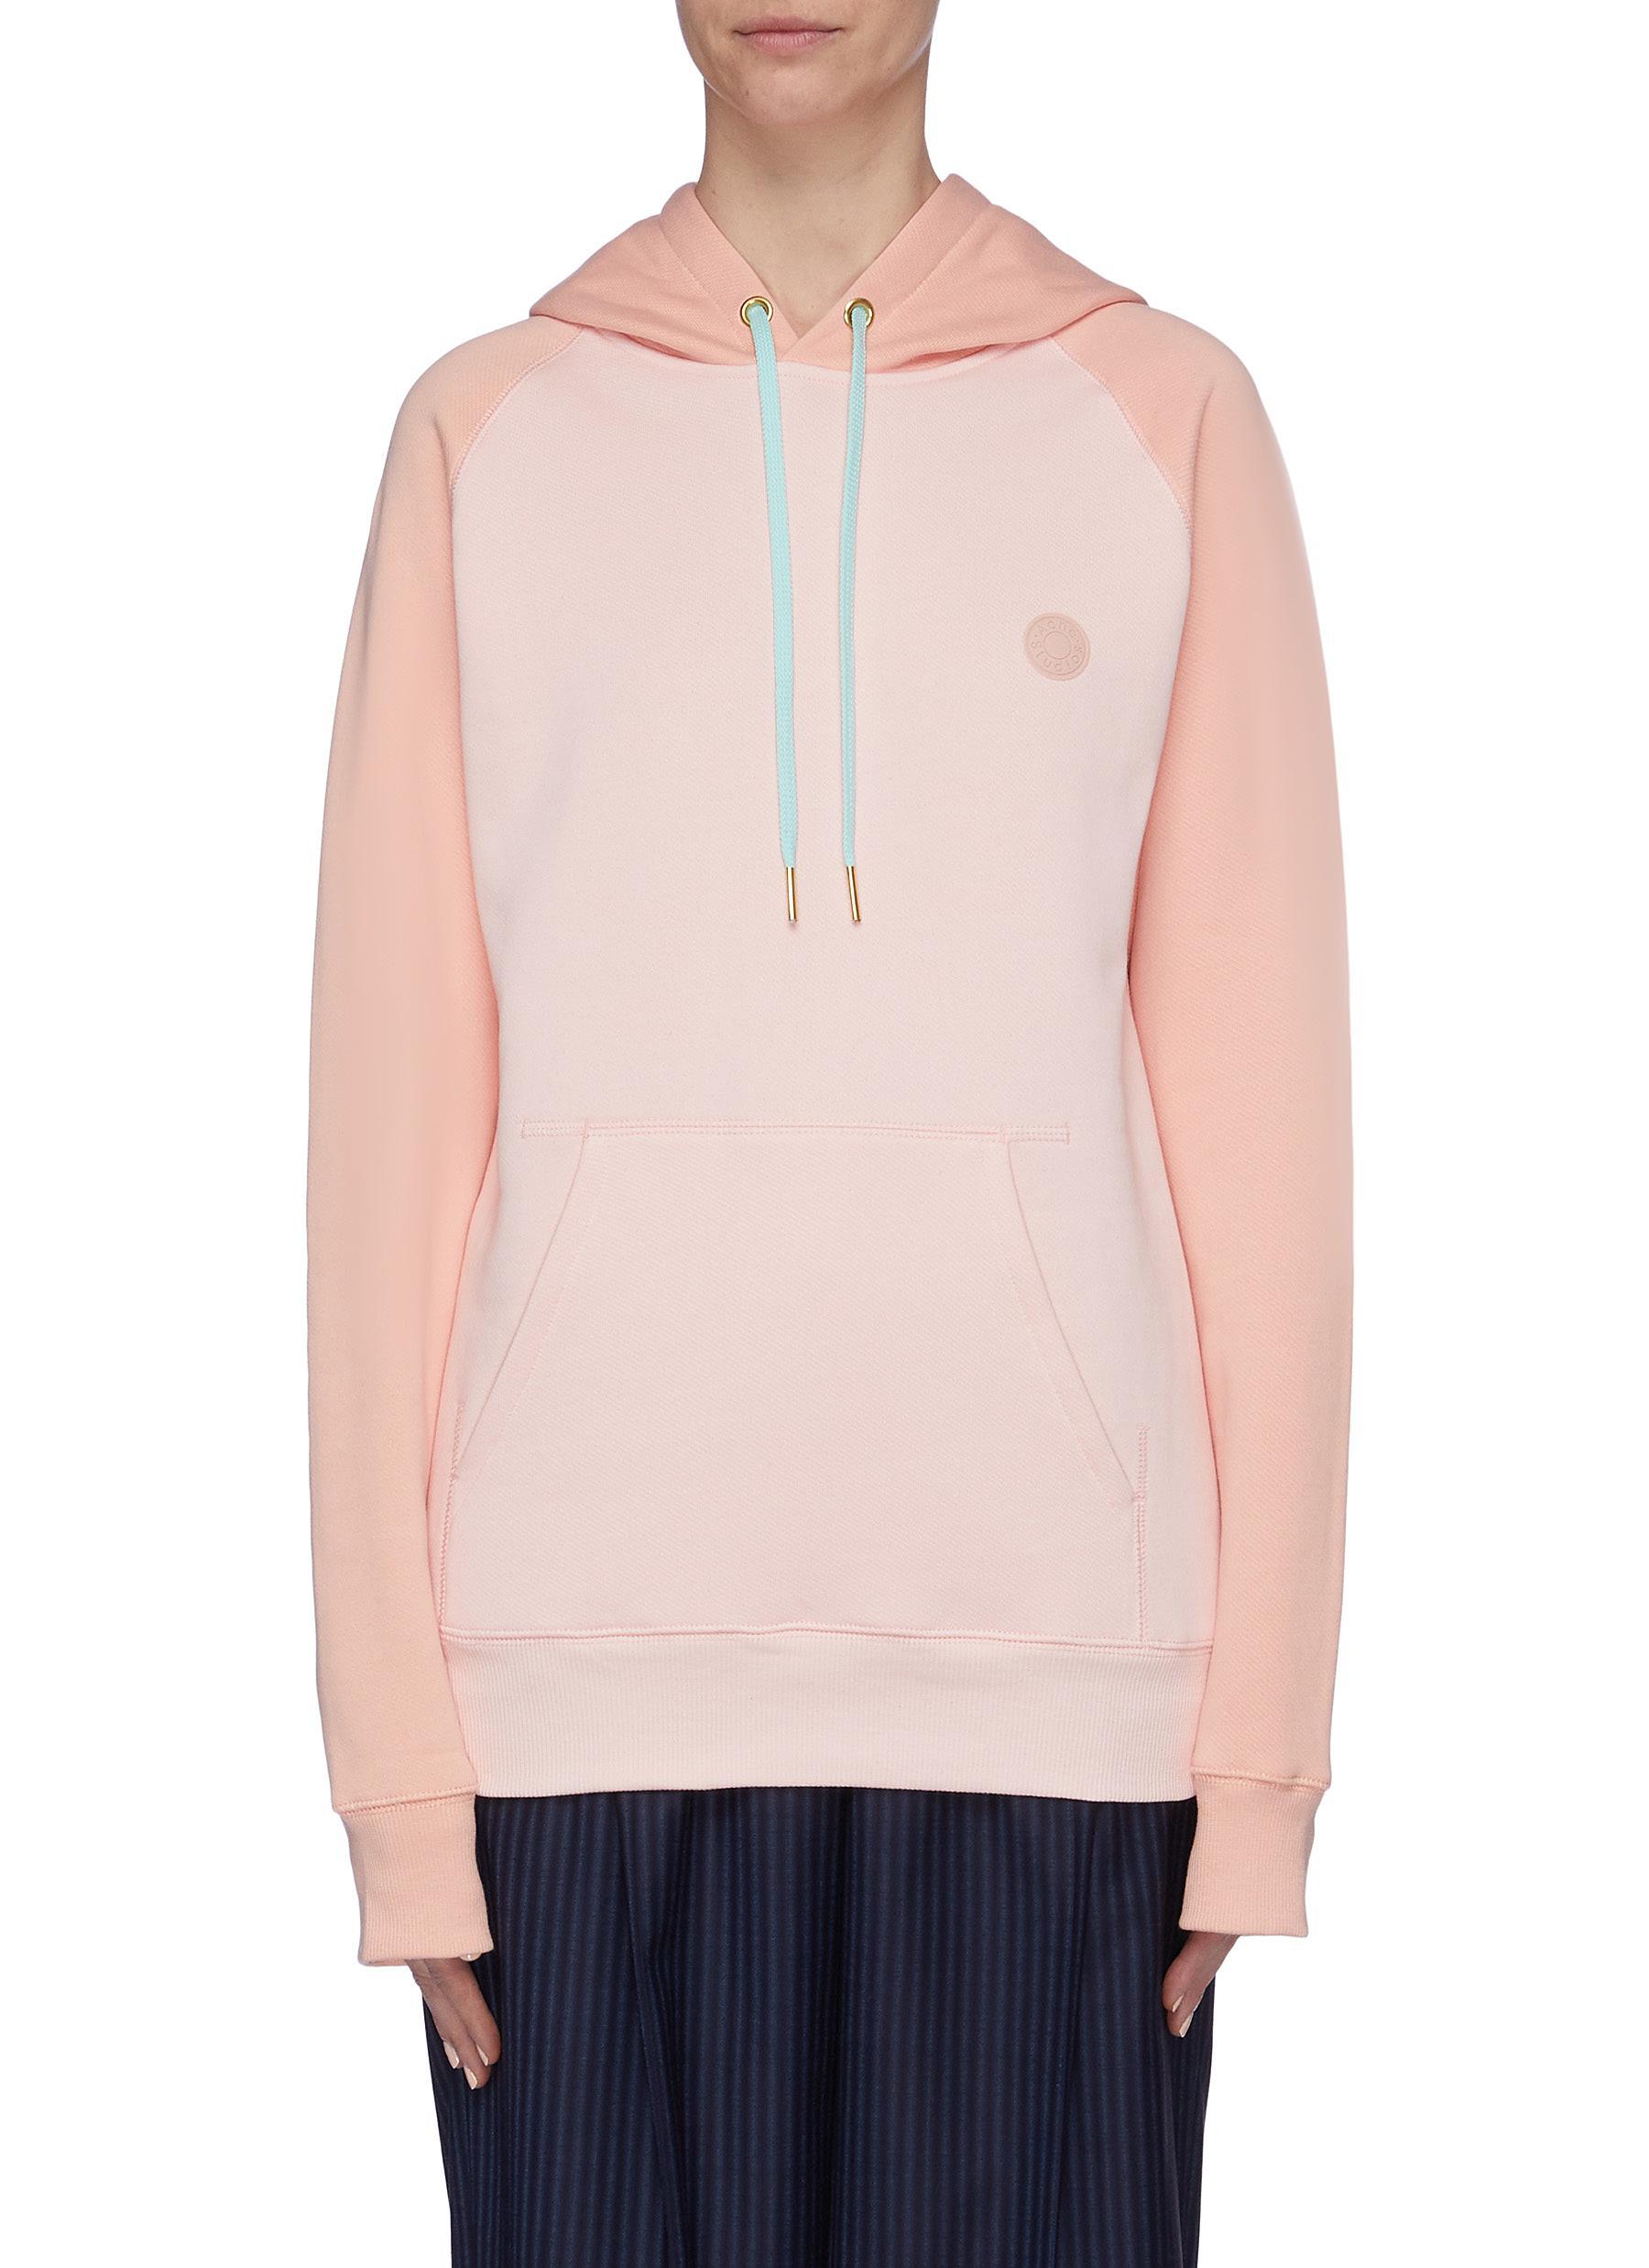 Colourblock hoodie by Acne Studios